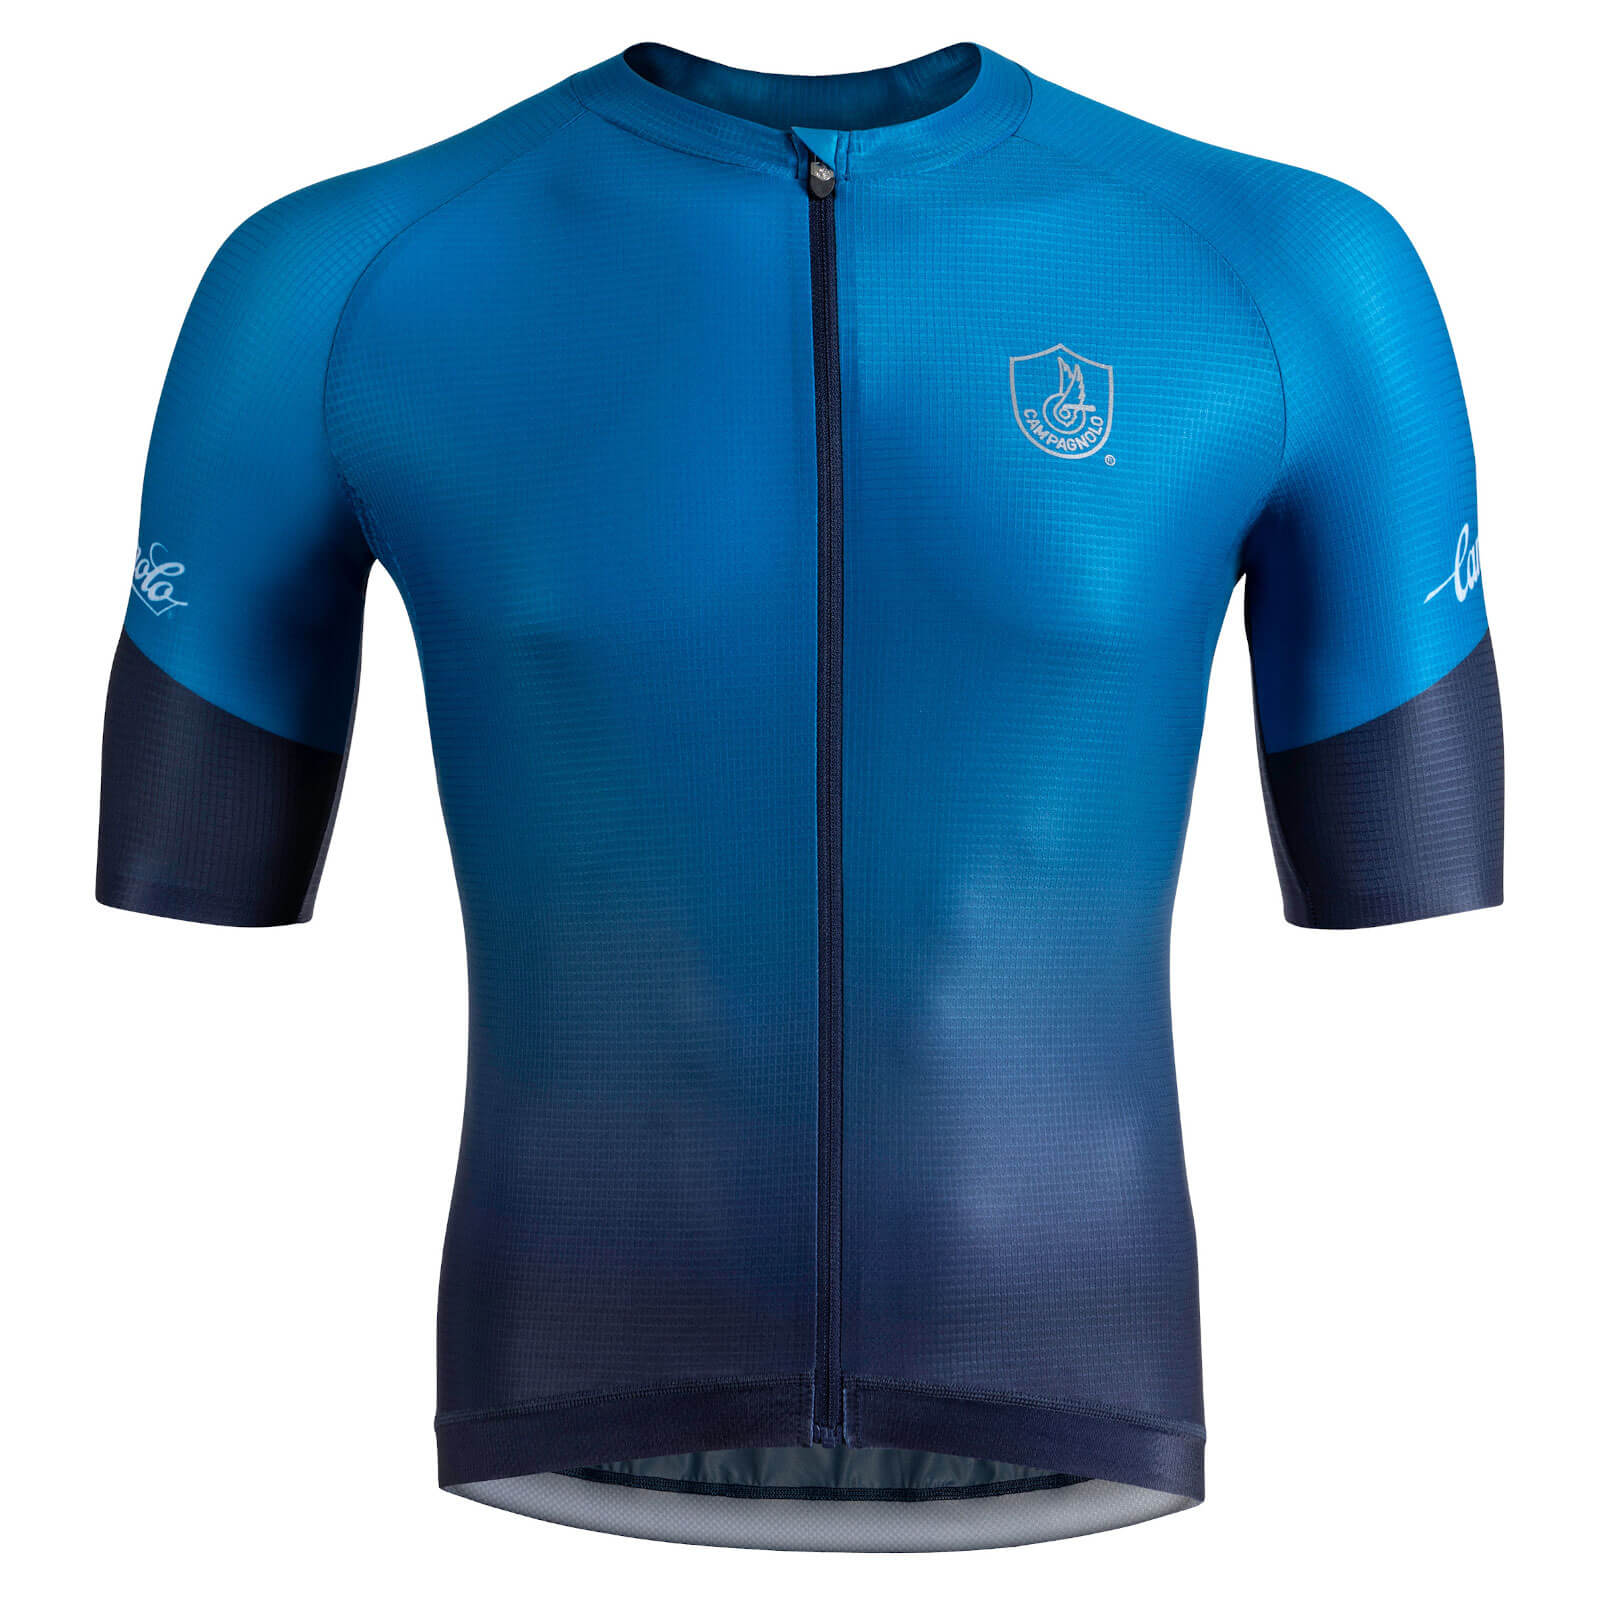 Nalini Campagnolo Platino Jersey - M - Blue/Navy Blue